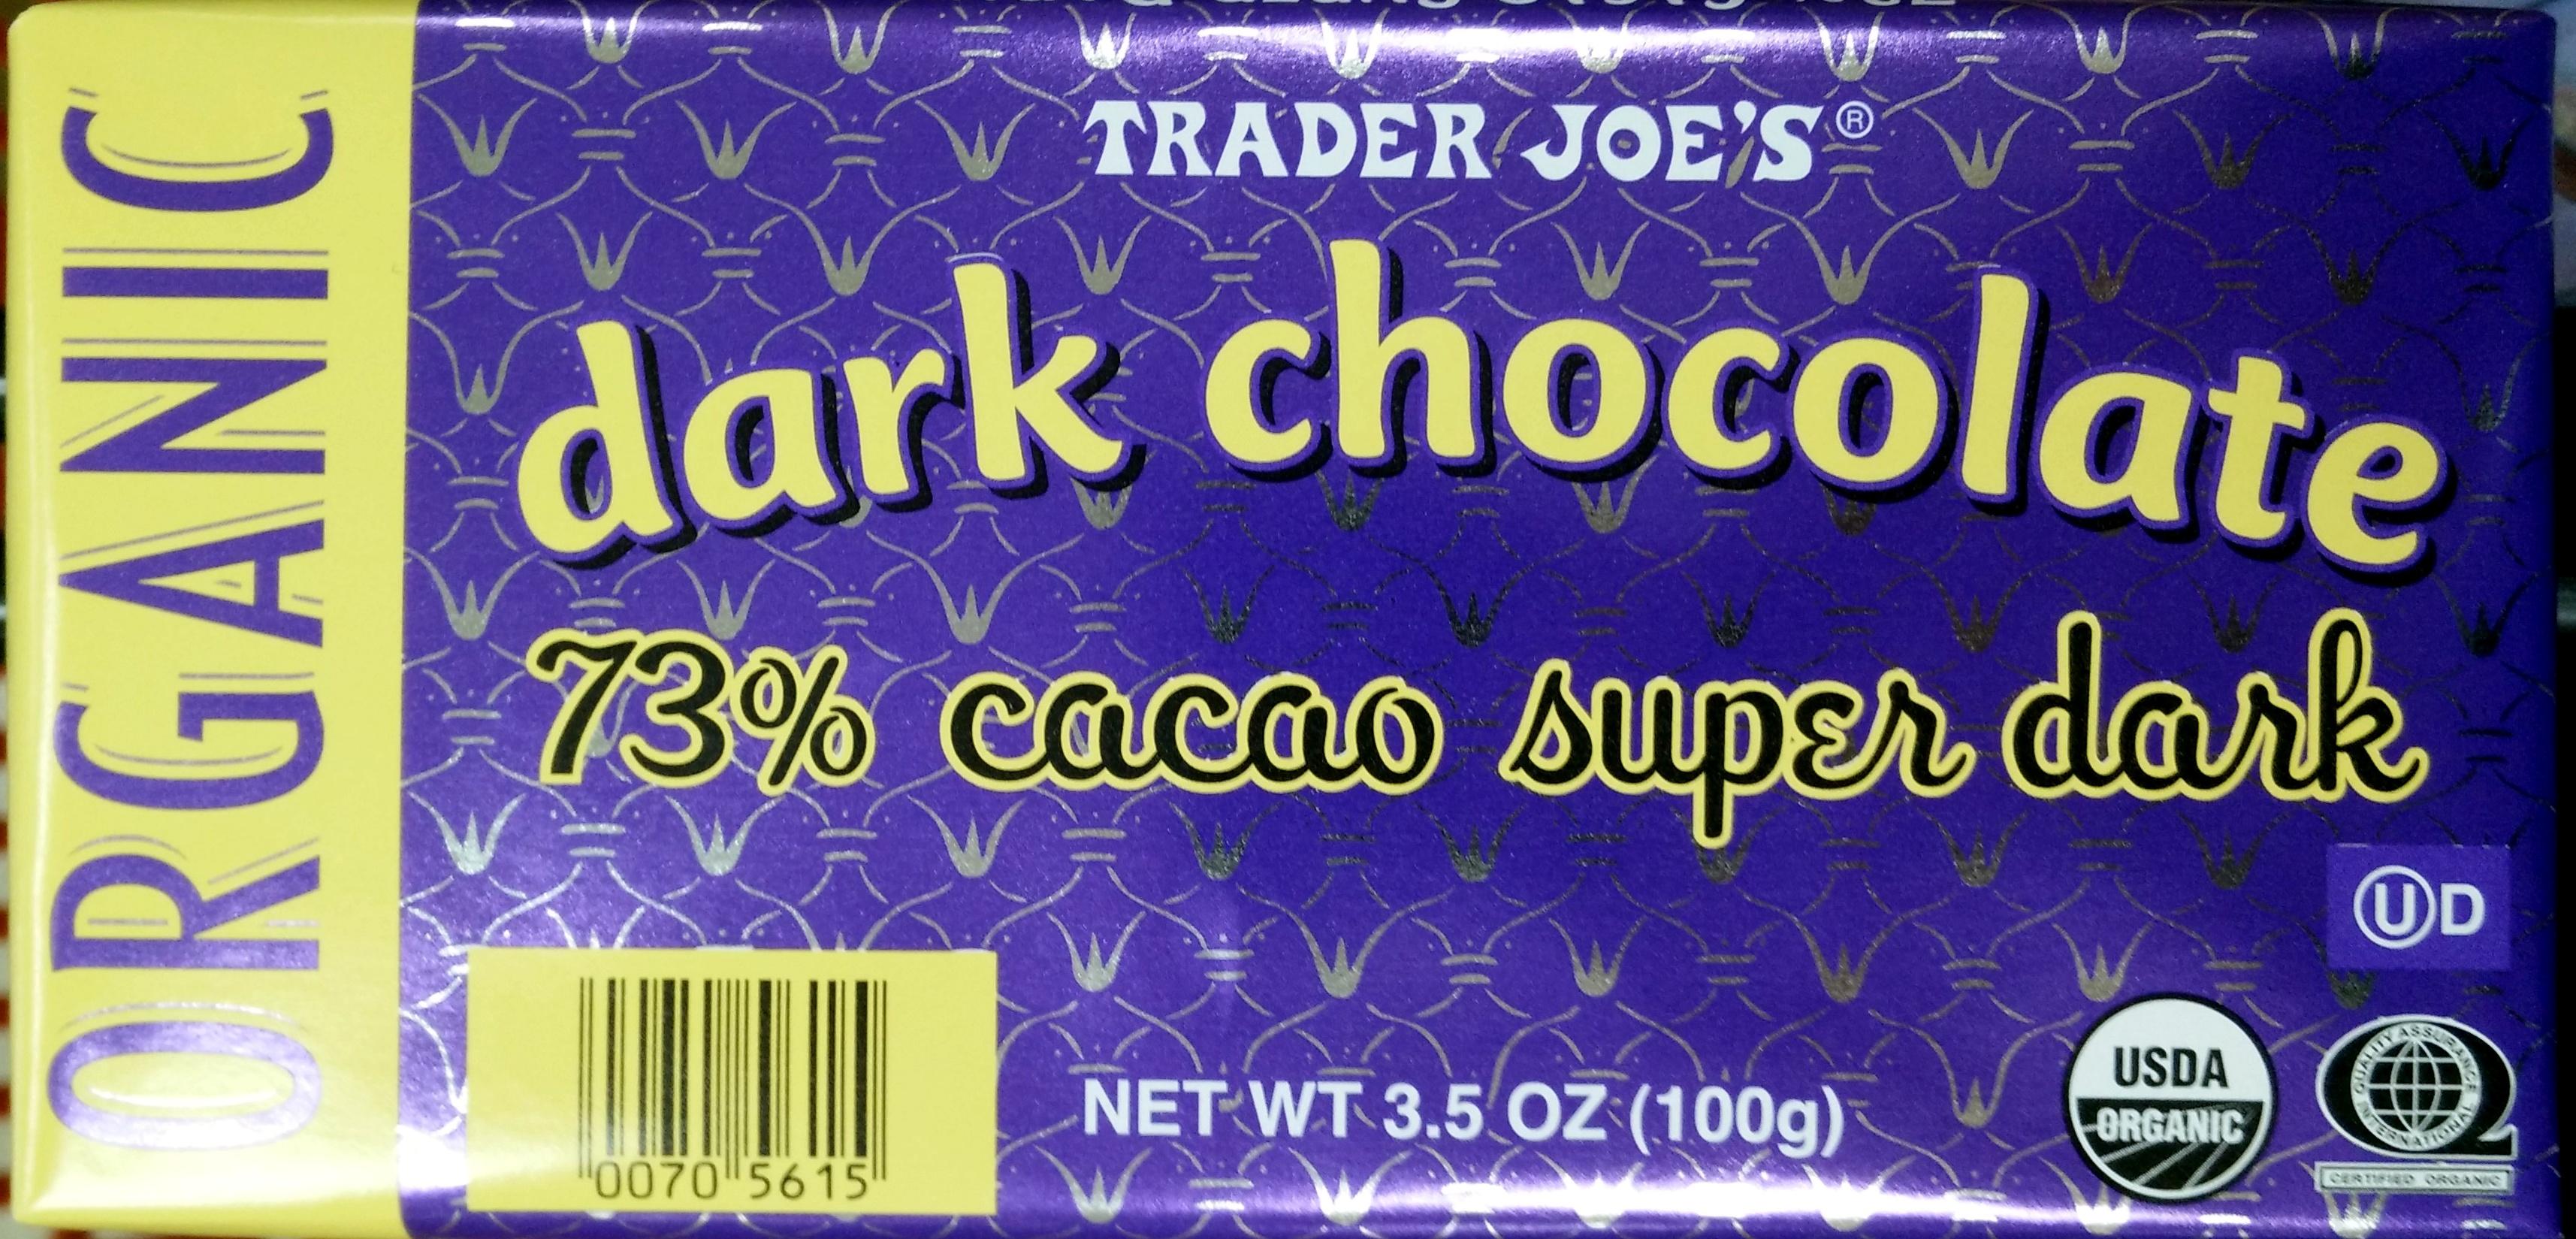 Dark Chocolate 73% cacao super dark - Product